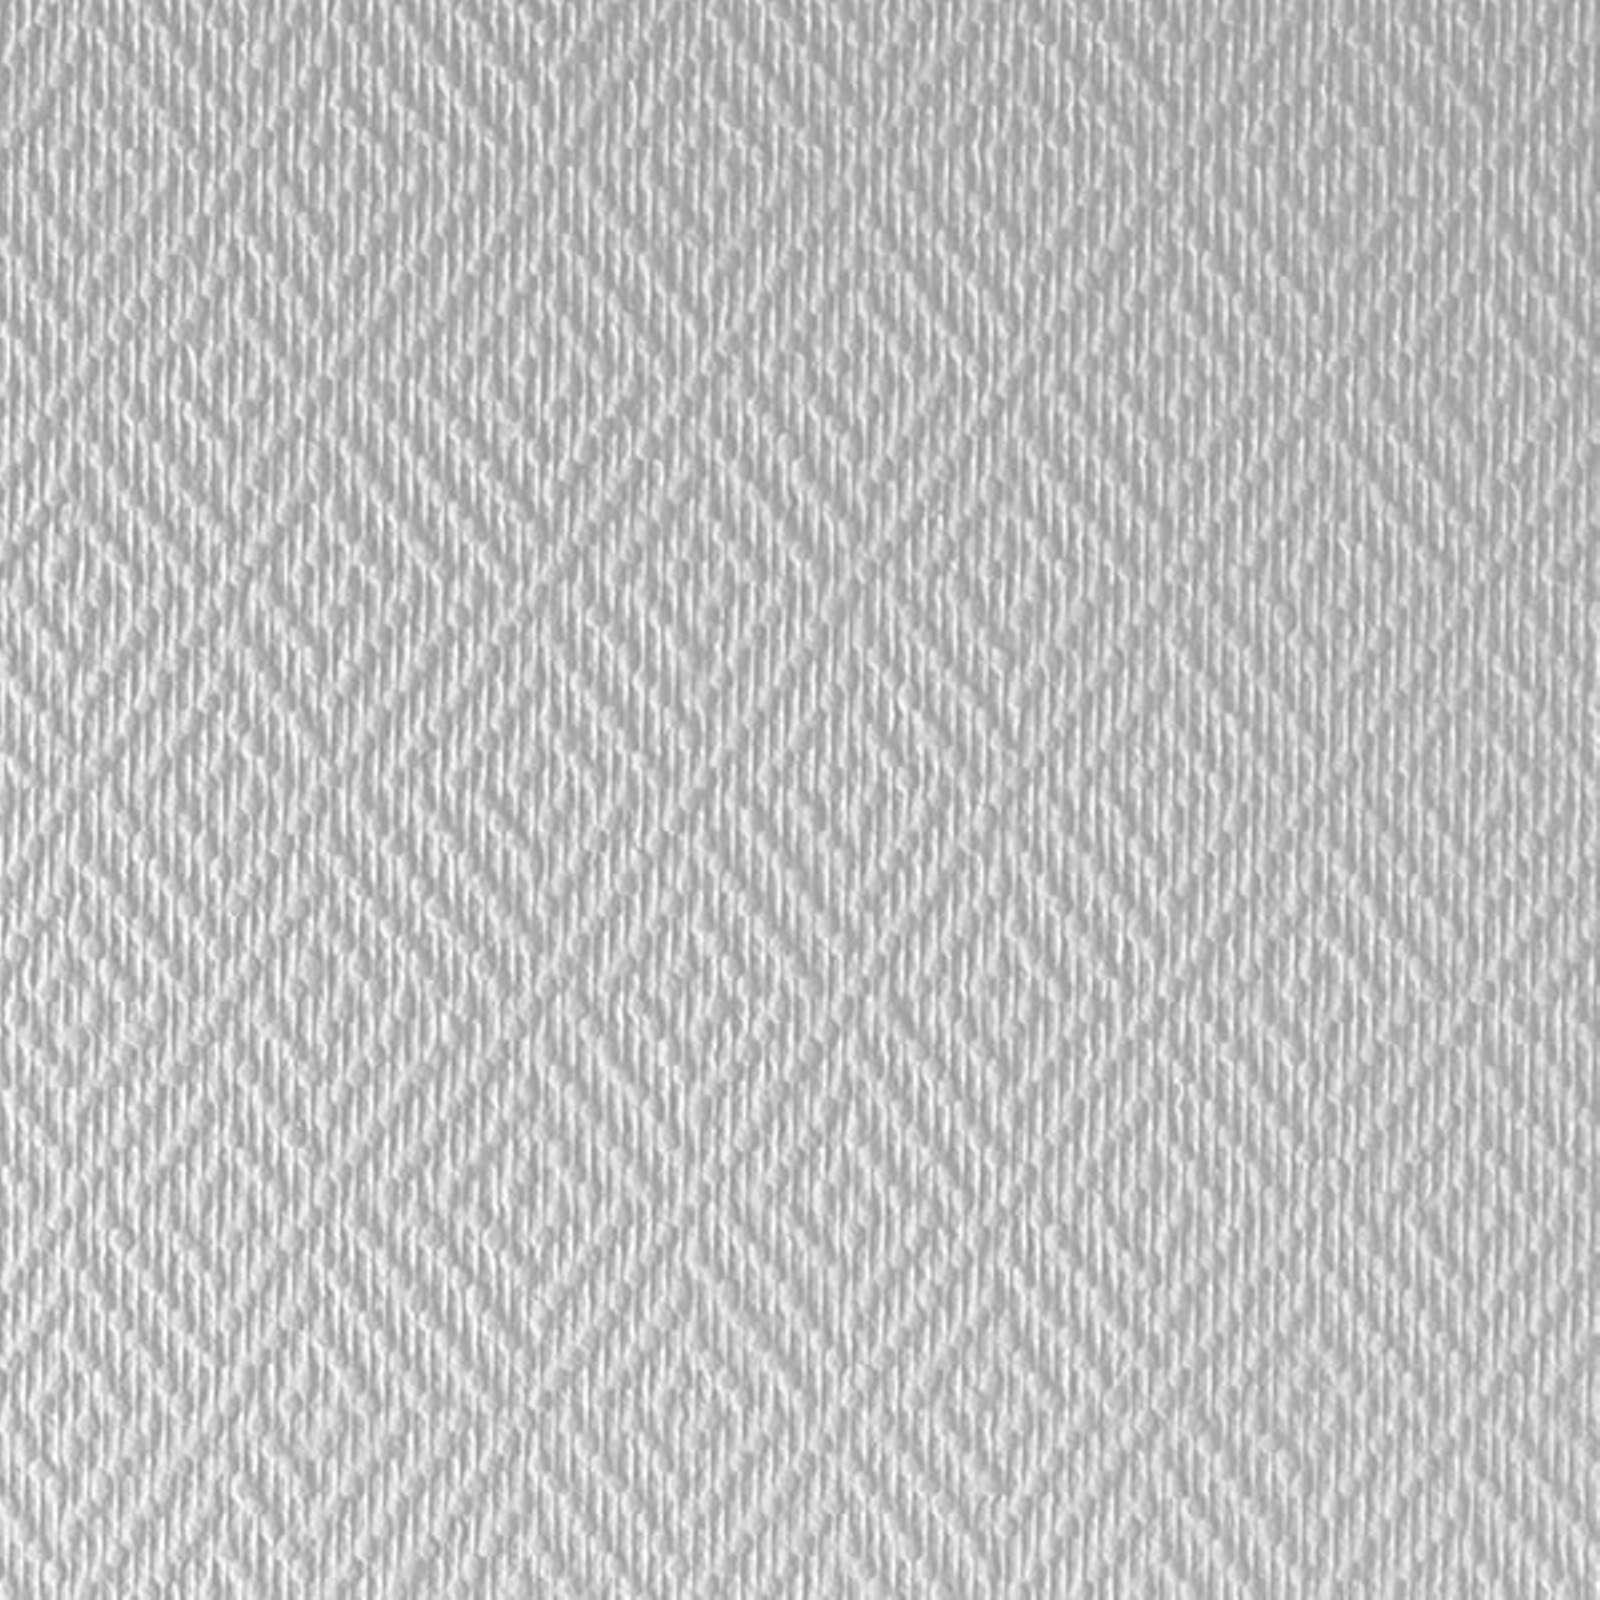 Стеклообои Wellton Classika Ромб WEL430